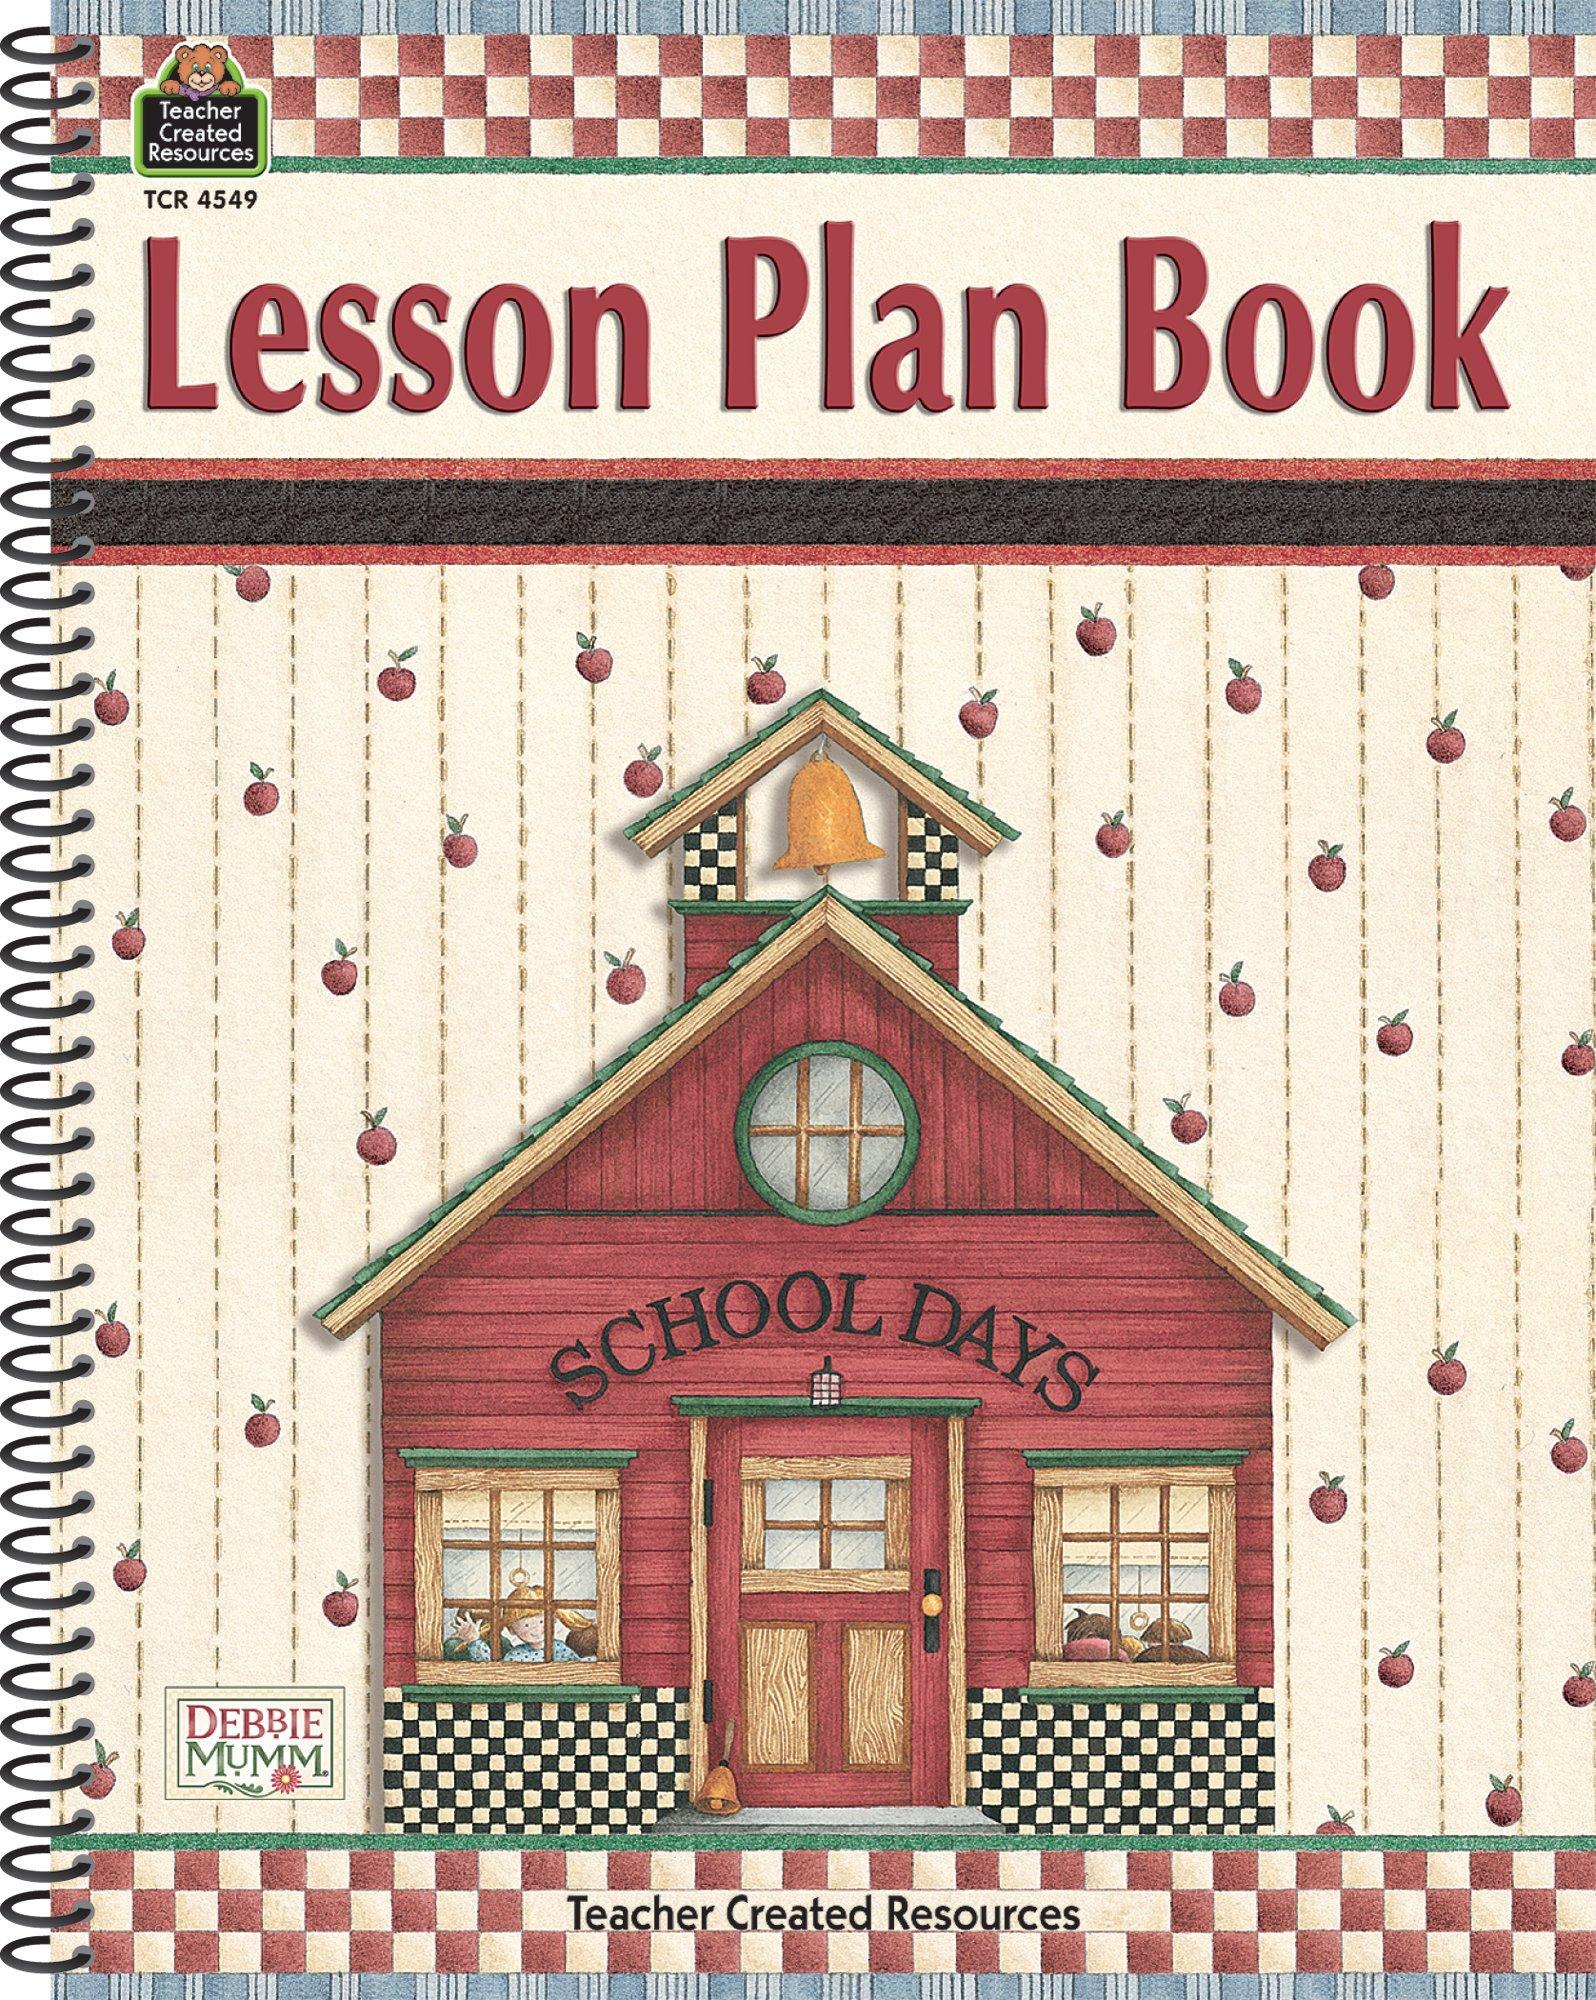 Lesson Plan Book Debbie Mumm product image